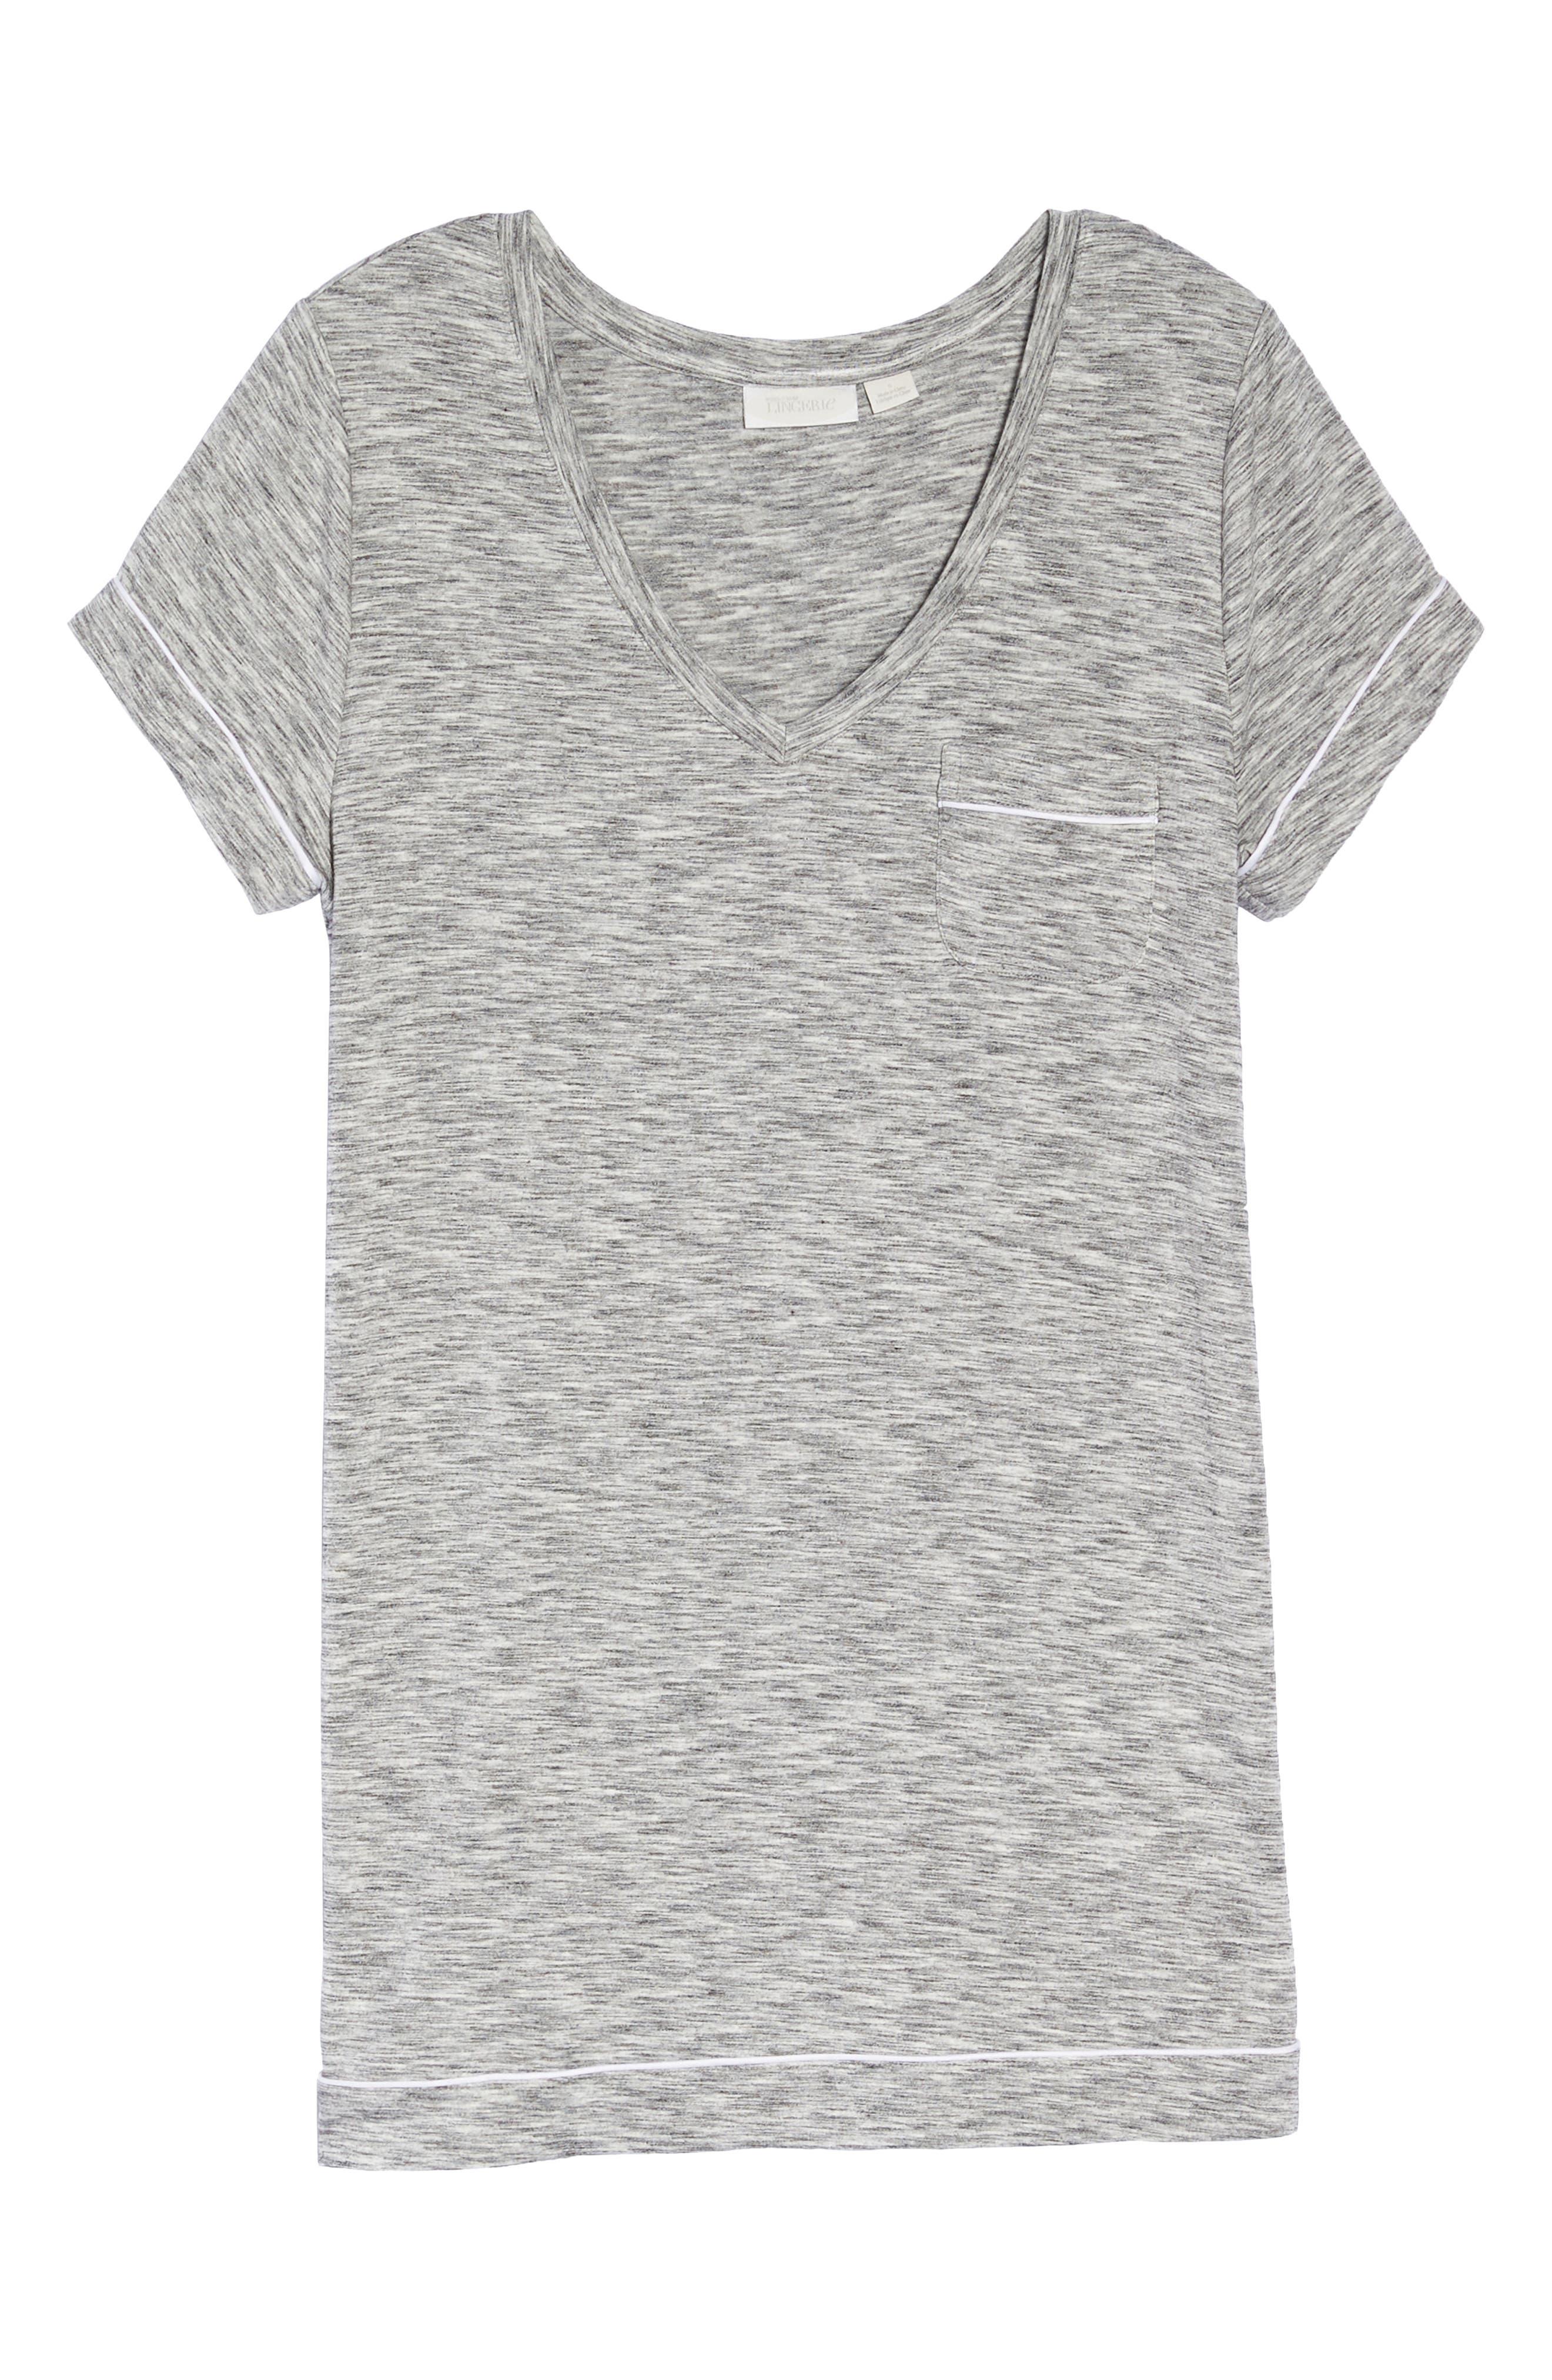 Moonlight Sleep Shirt,                             Alternate thumbnail 6, color,                             GREY SPACEDYE